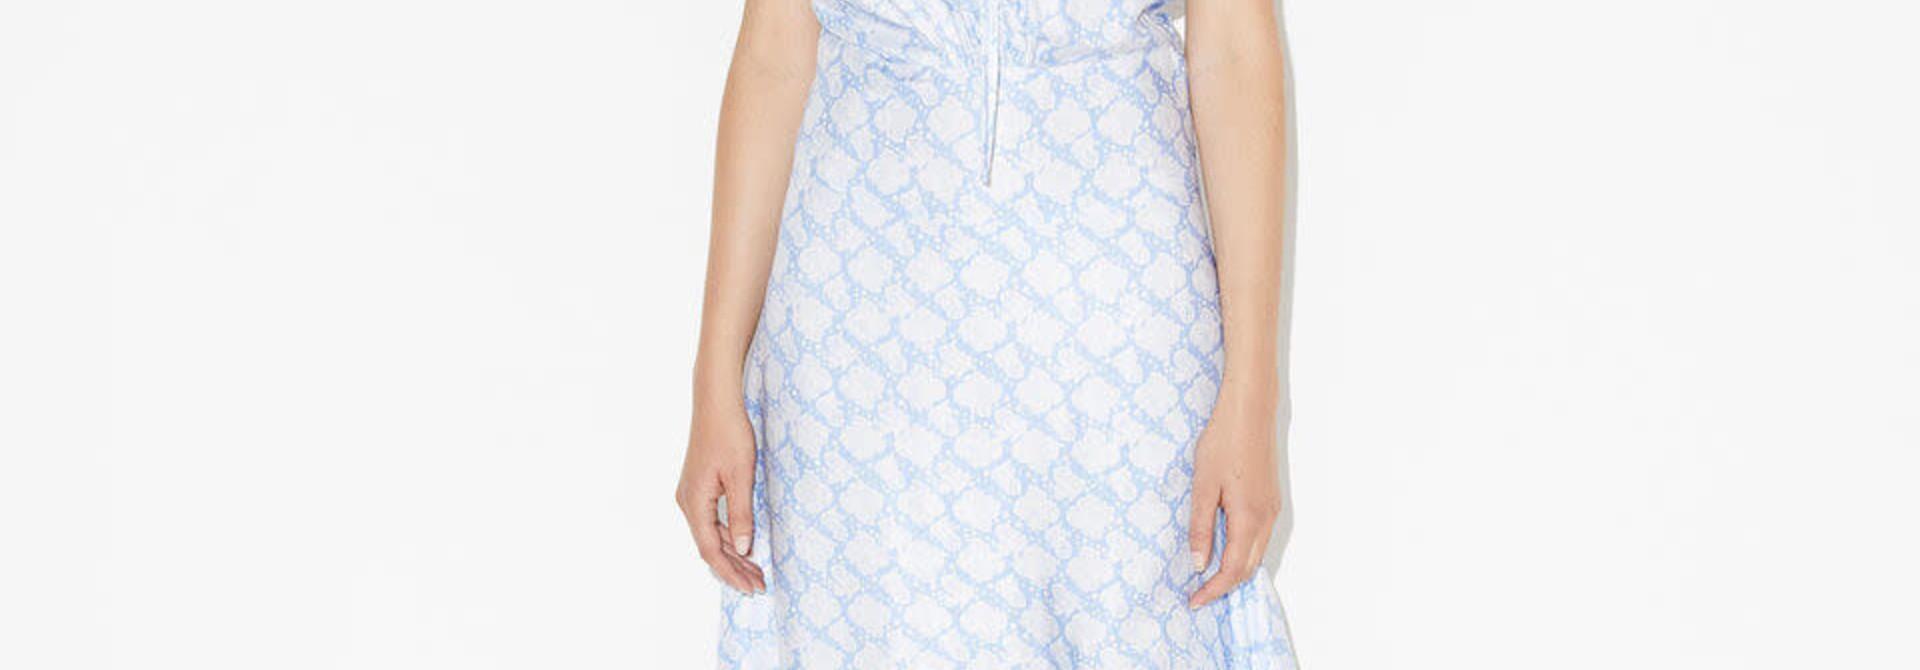 Paine dress by malene birger